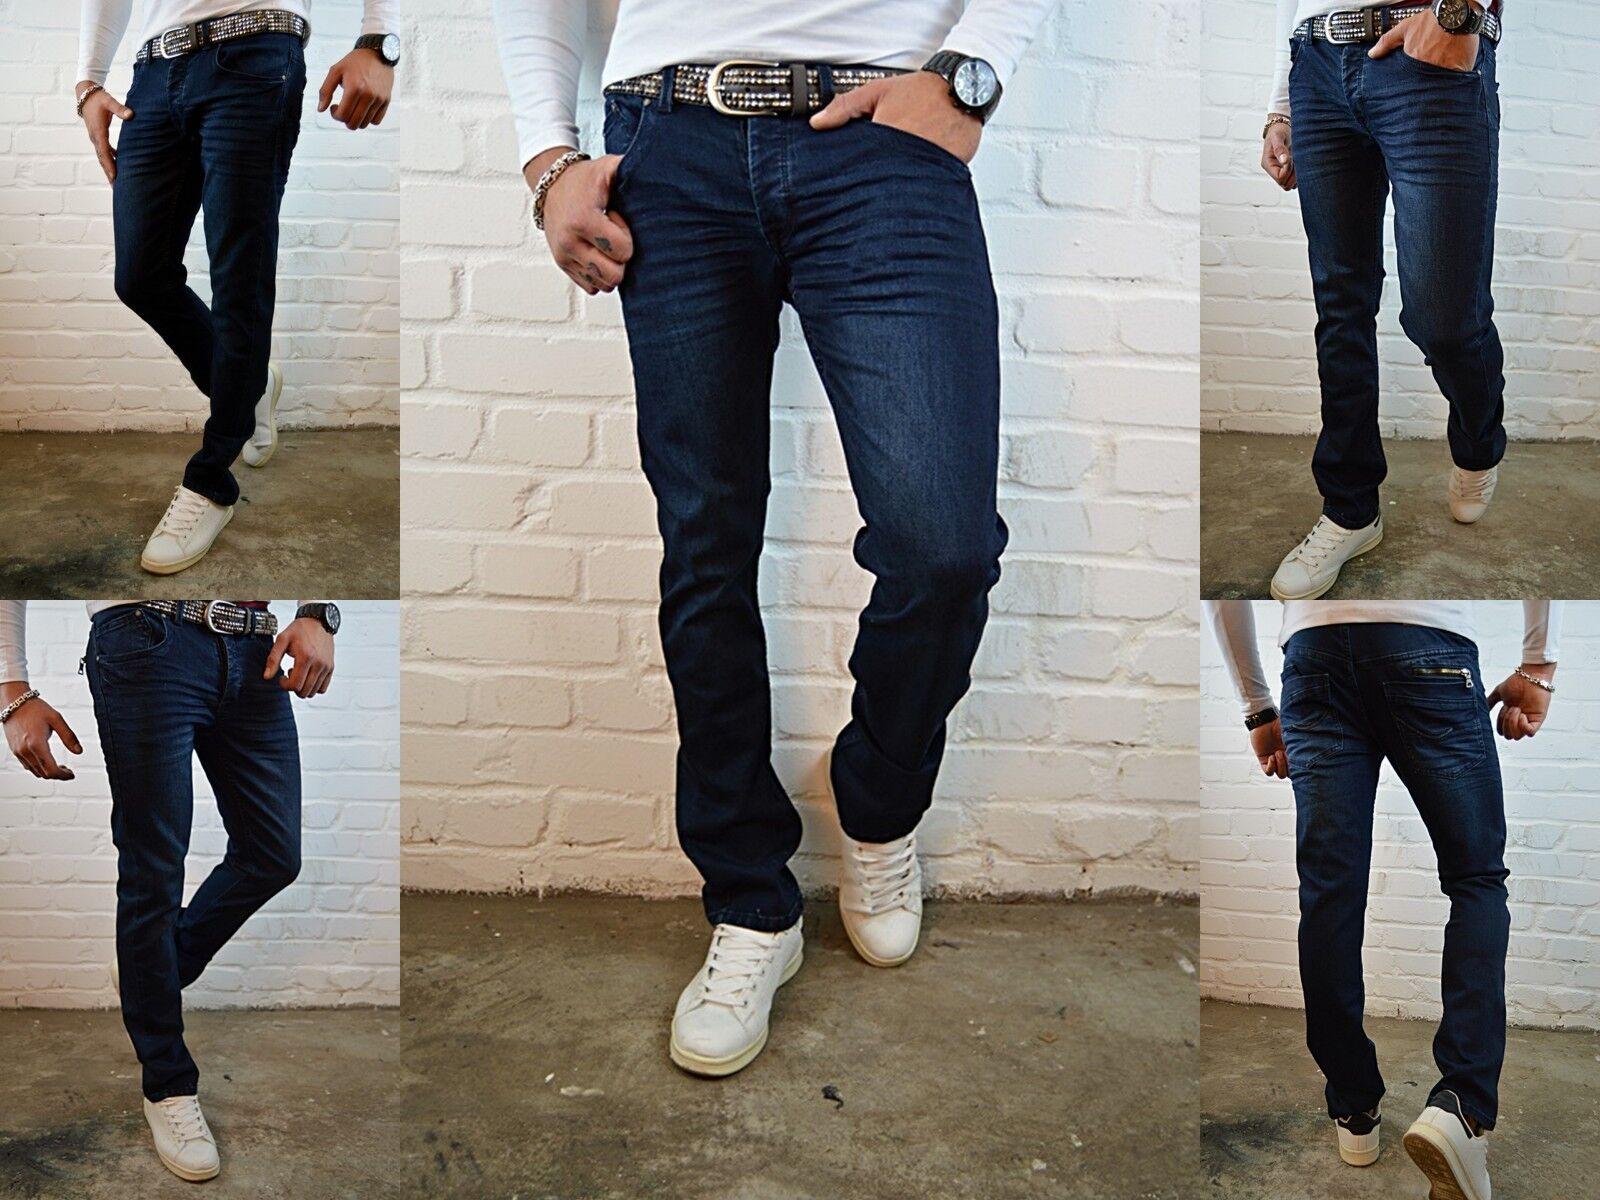 Uomo Base blu Young Destroyed Moda Taglio Diritto Aderente Jeans Pantaloni